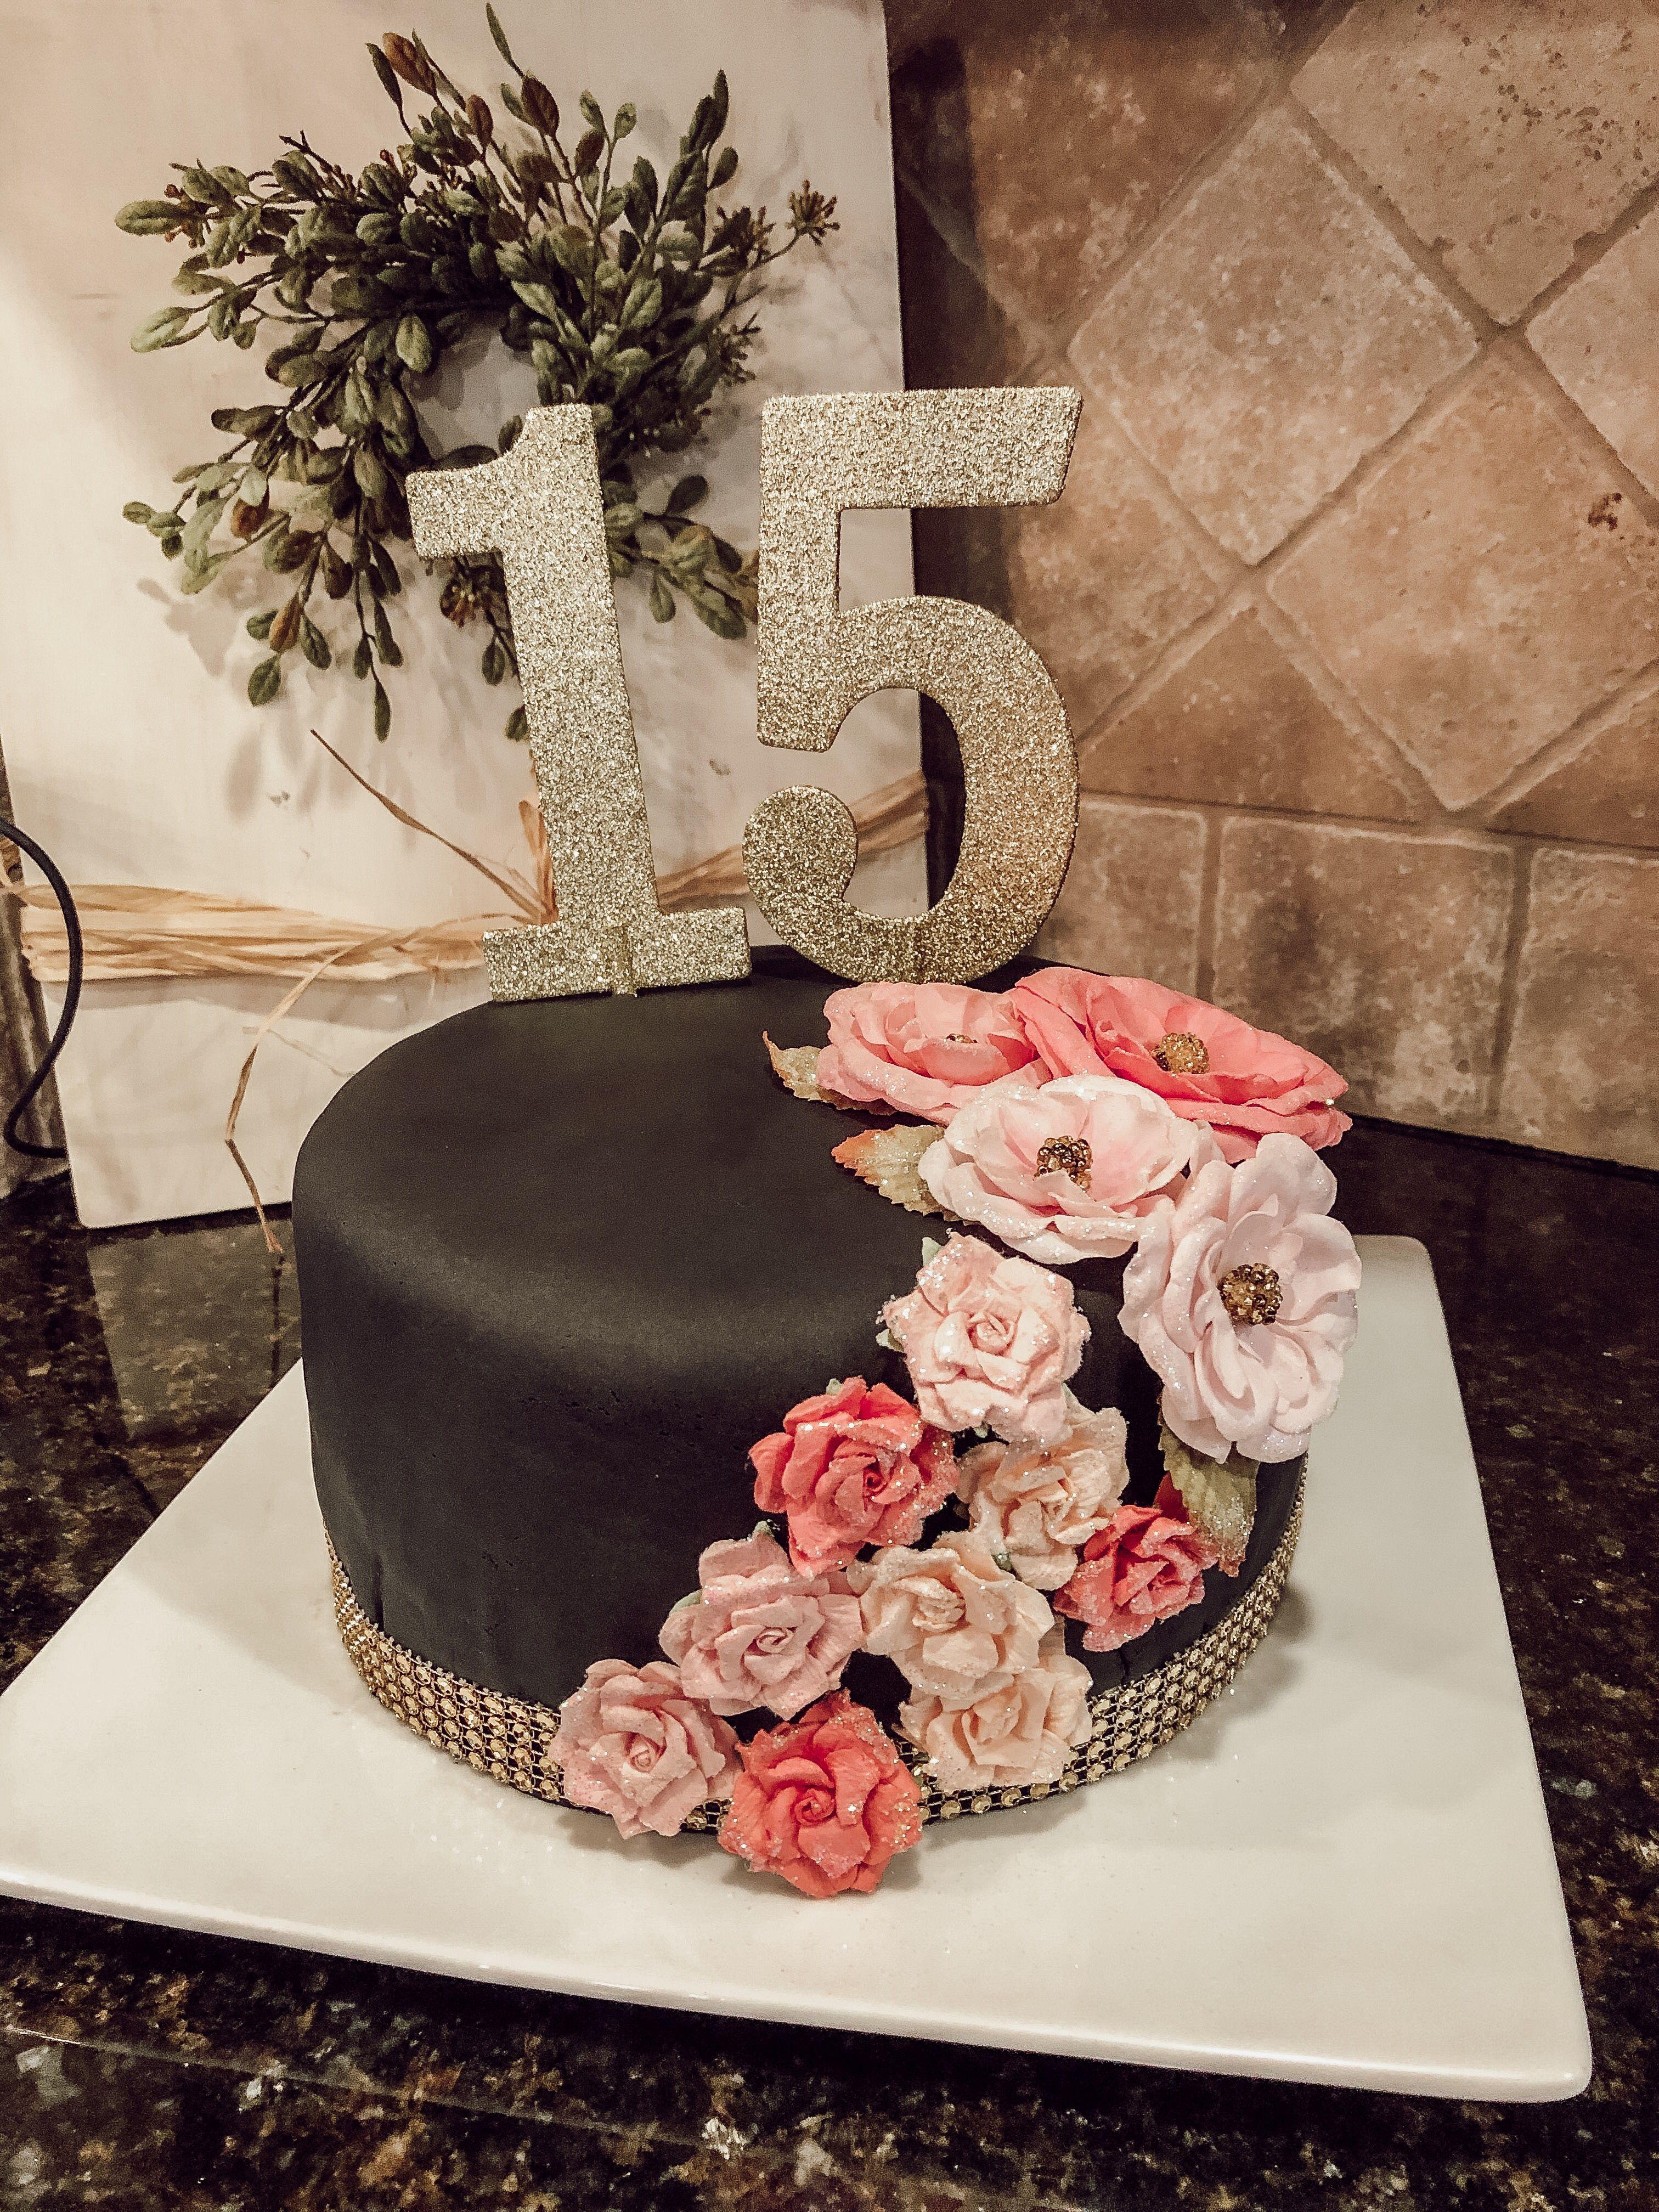 15 Birthday Cake Ideas Girl : birthday, ideas, Breanna, Davidson, Birthday, Cakes,, Girls,, Unique, Cakes